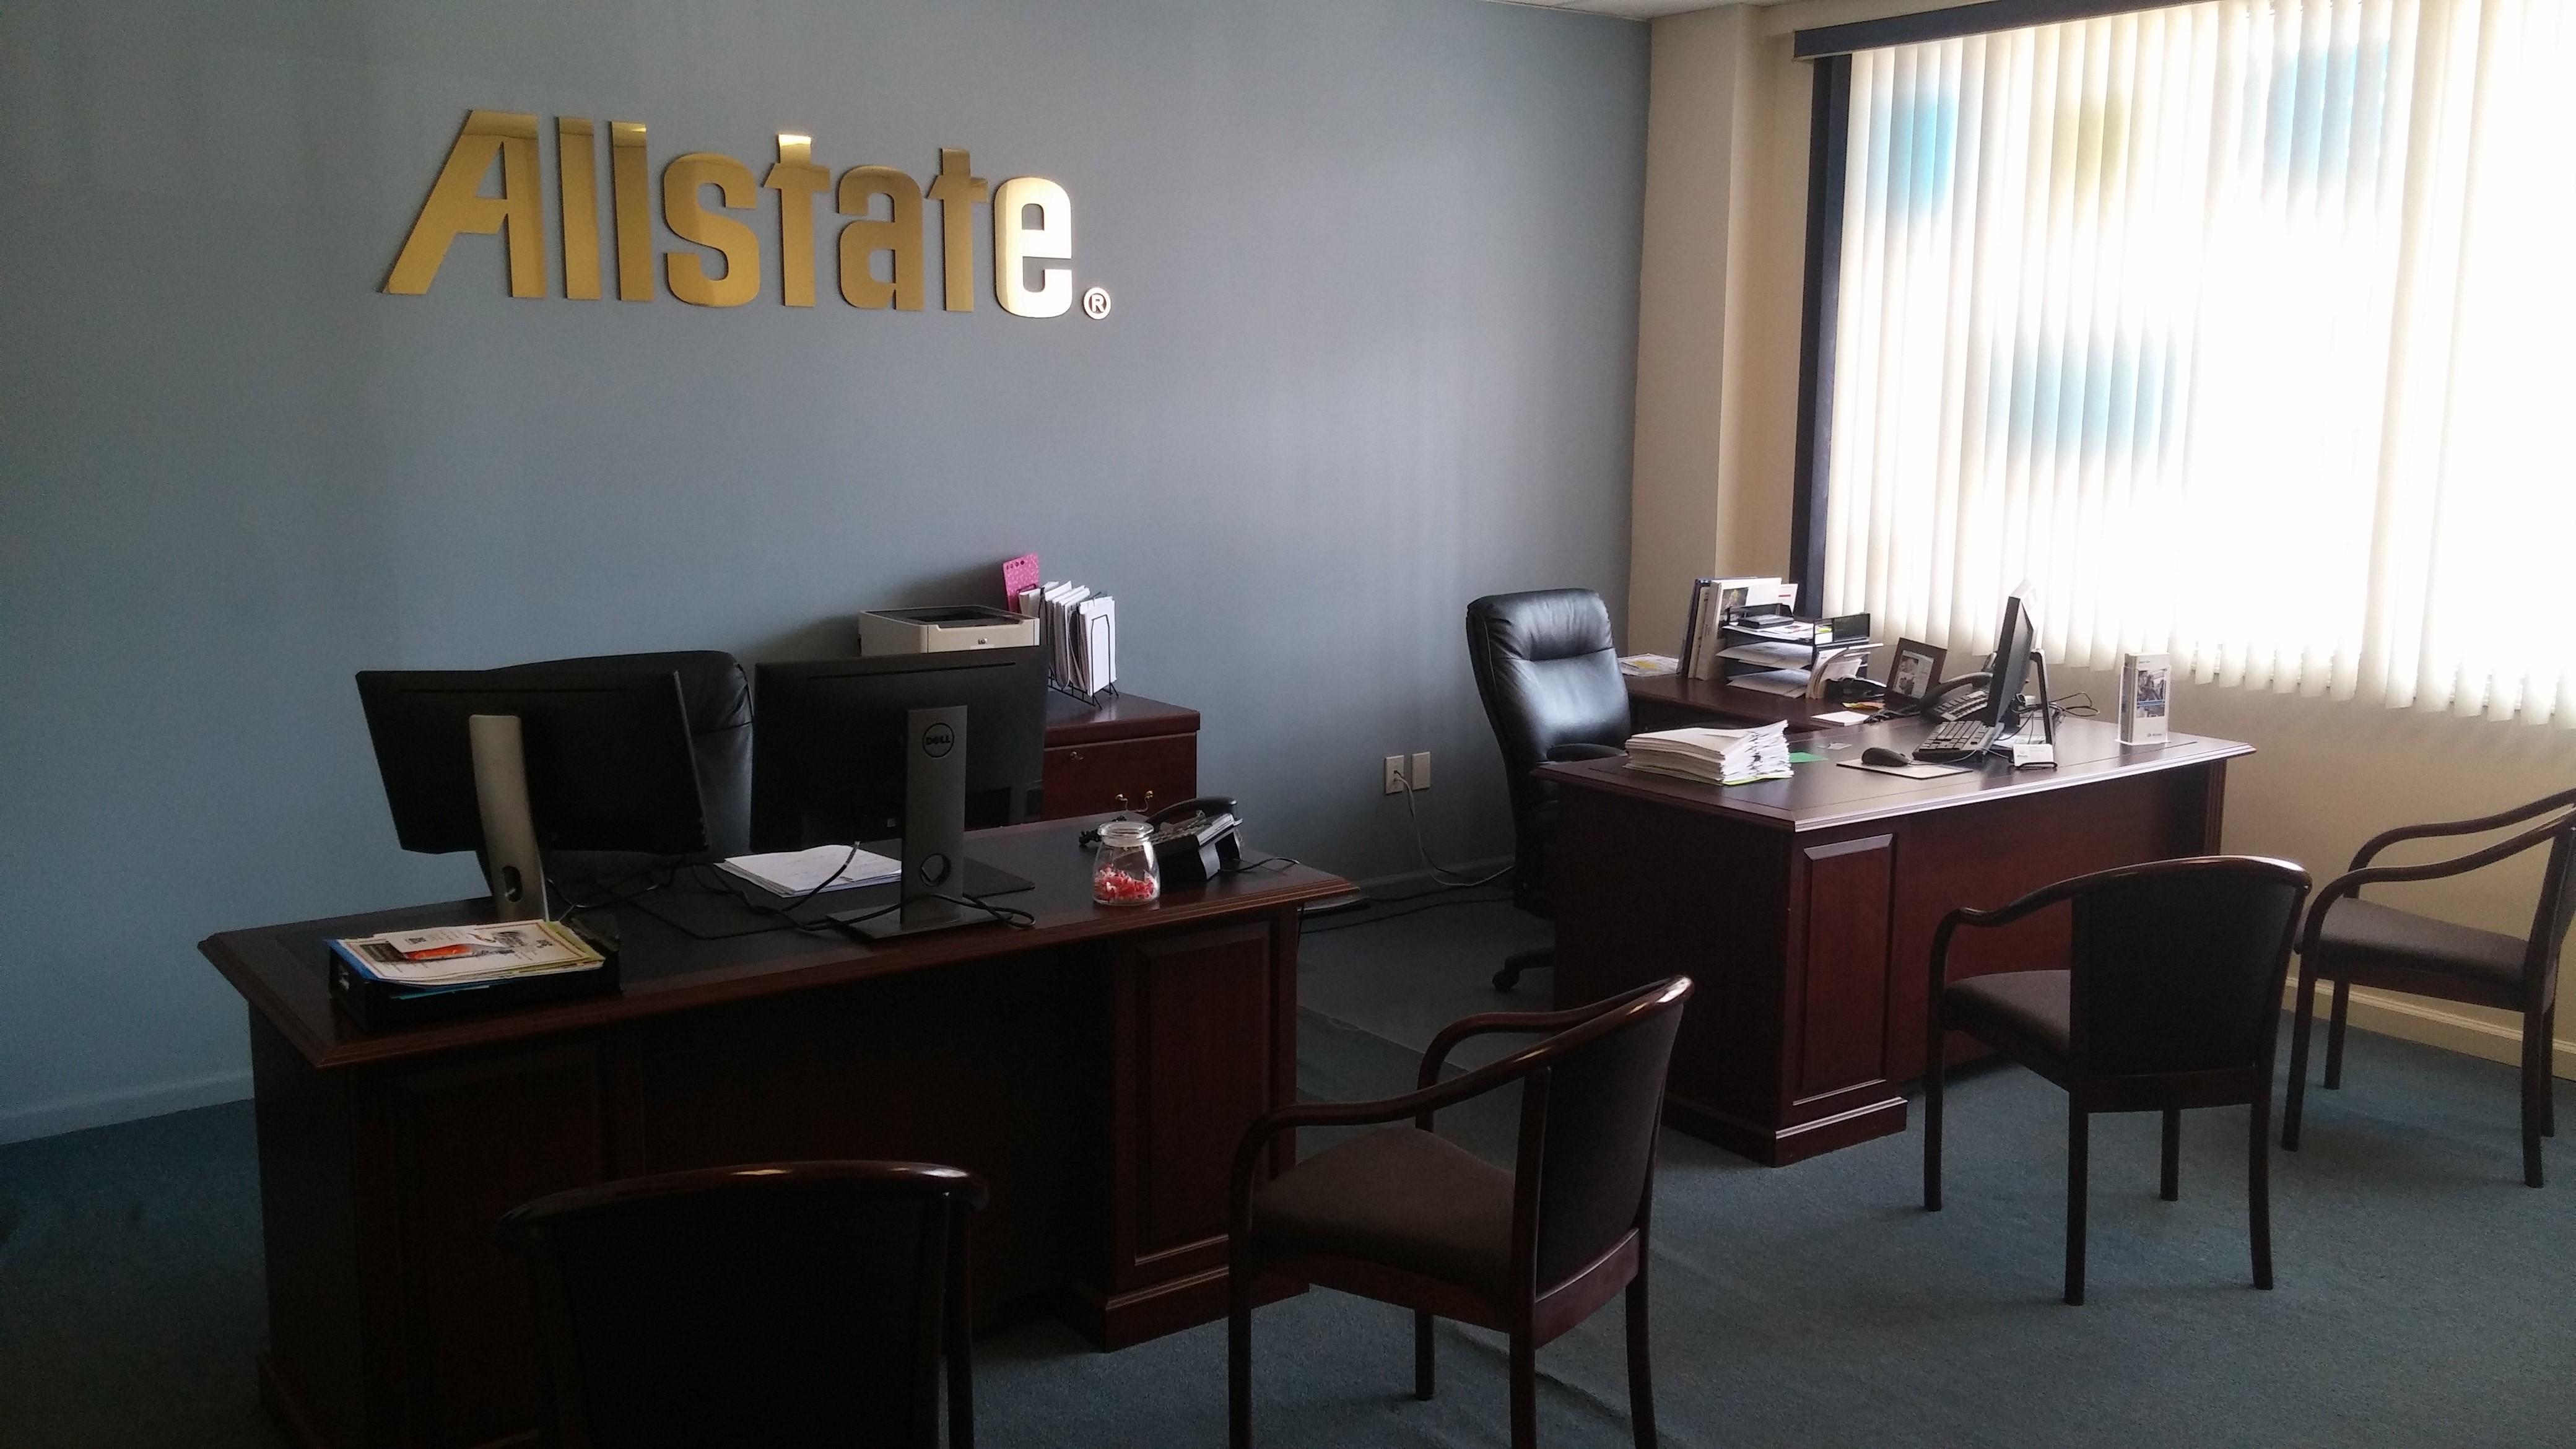 Allstate Insurance Agent: Michael W Rush image 2